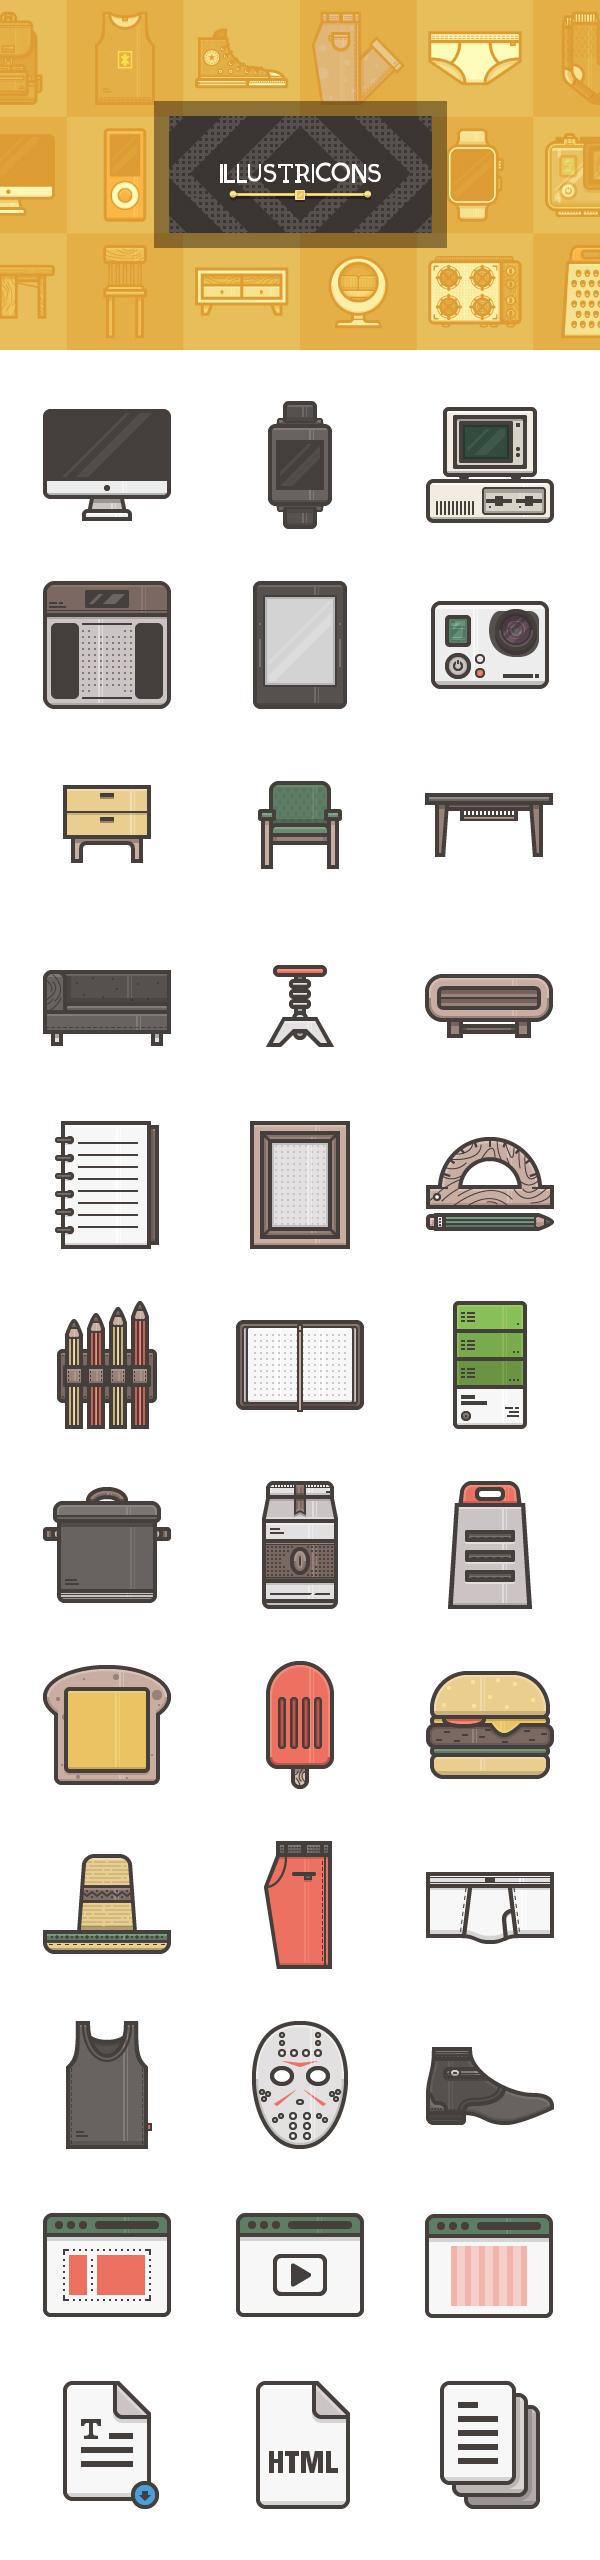 illustricons-free-600